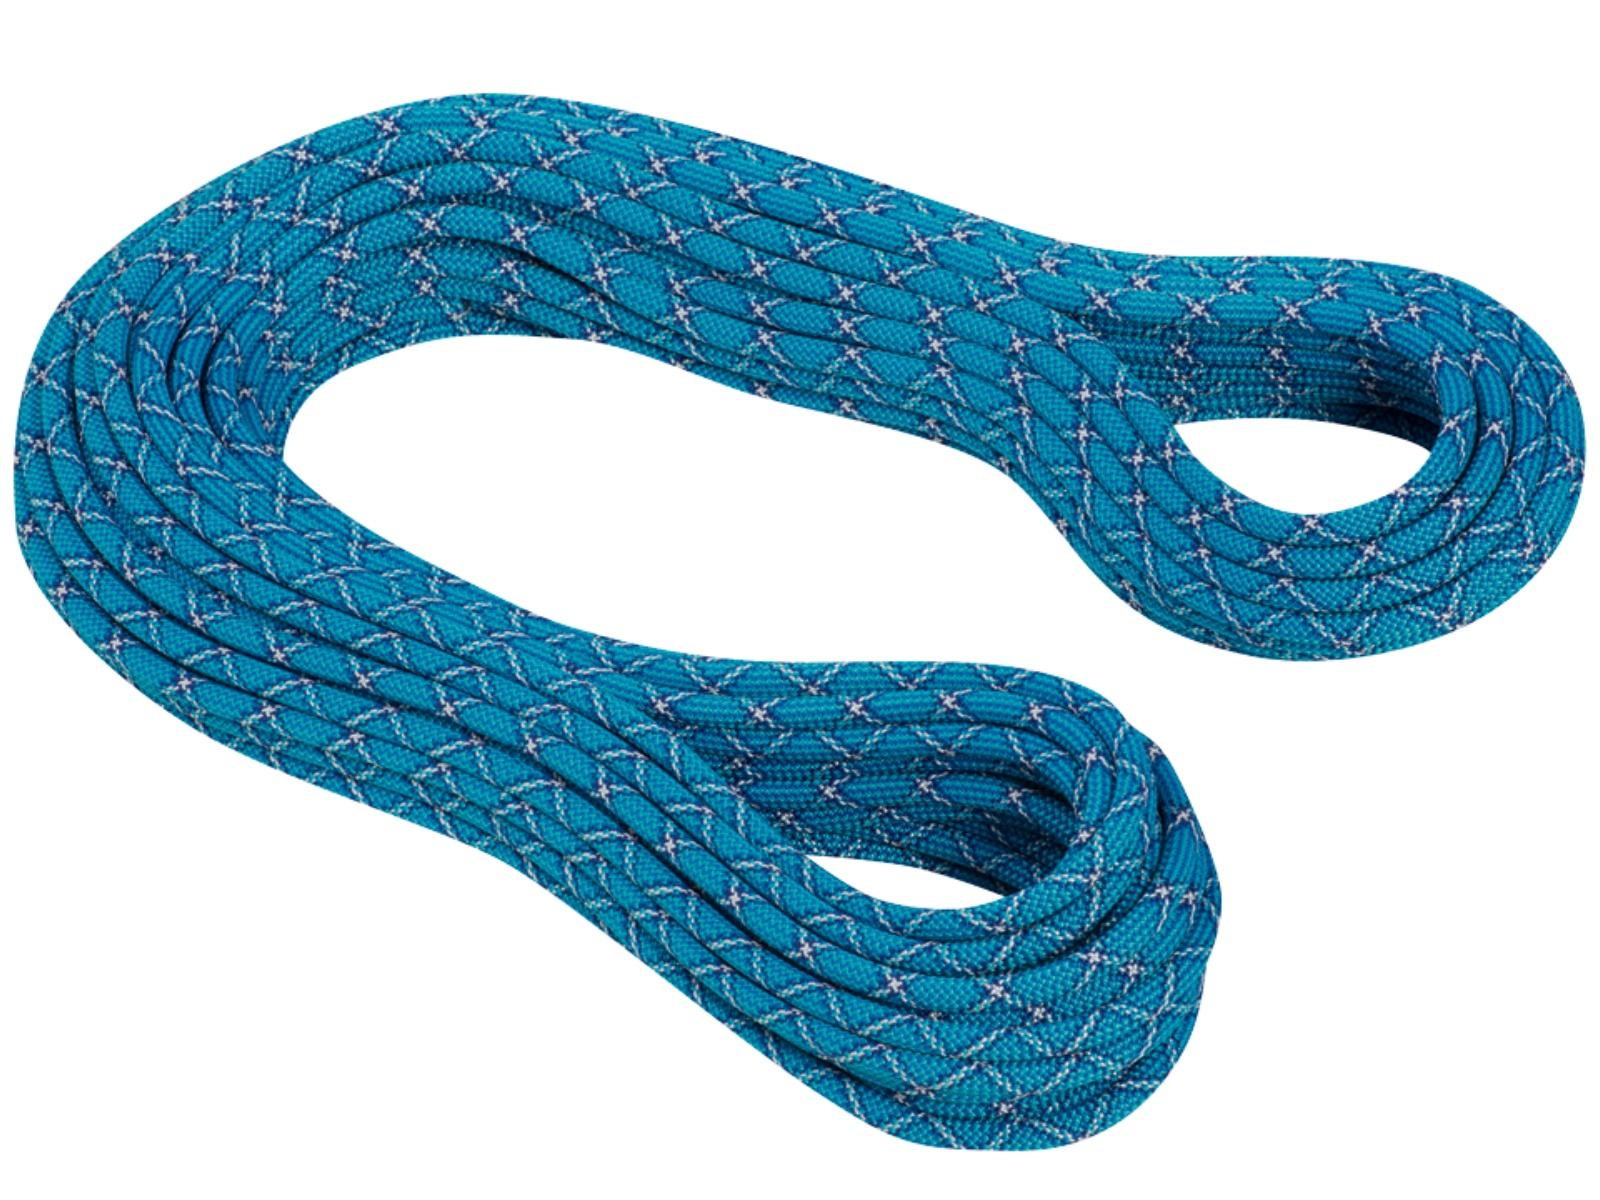 Horolezecké lano MAMMUT 9.5 Infinity Protect 60 m - modré